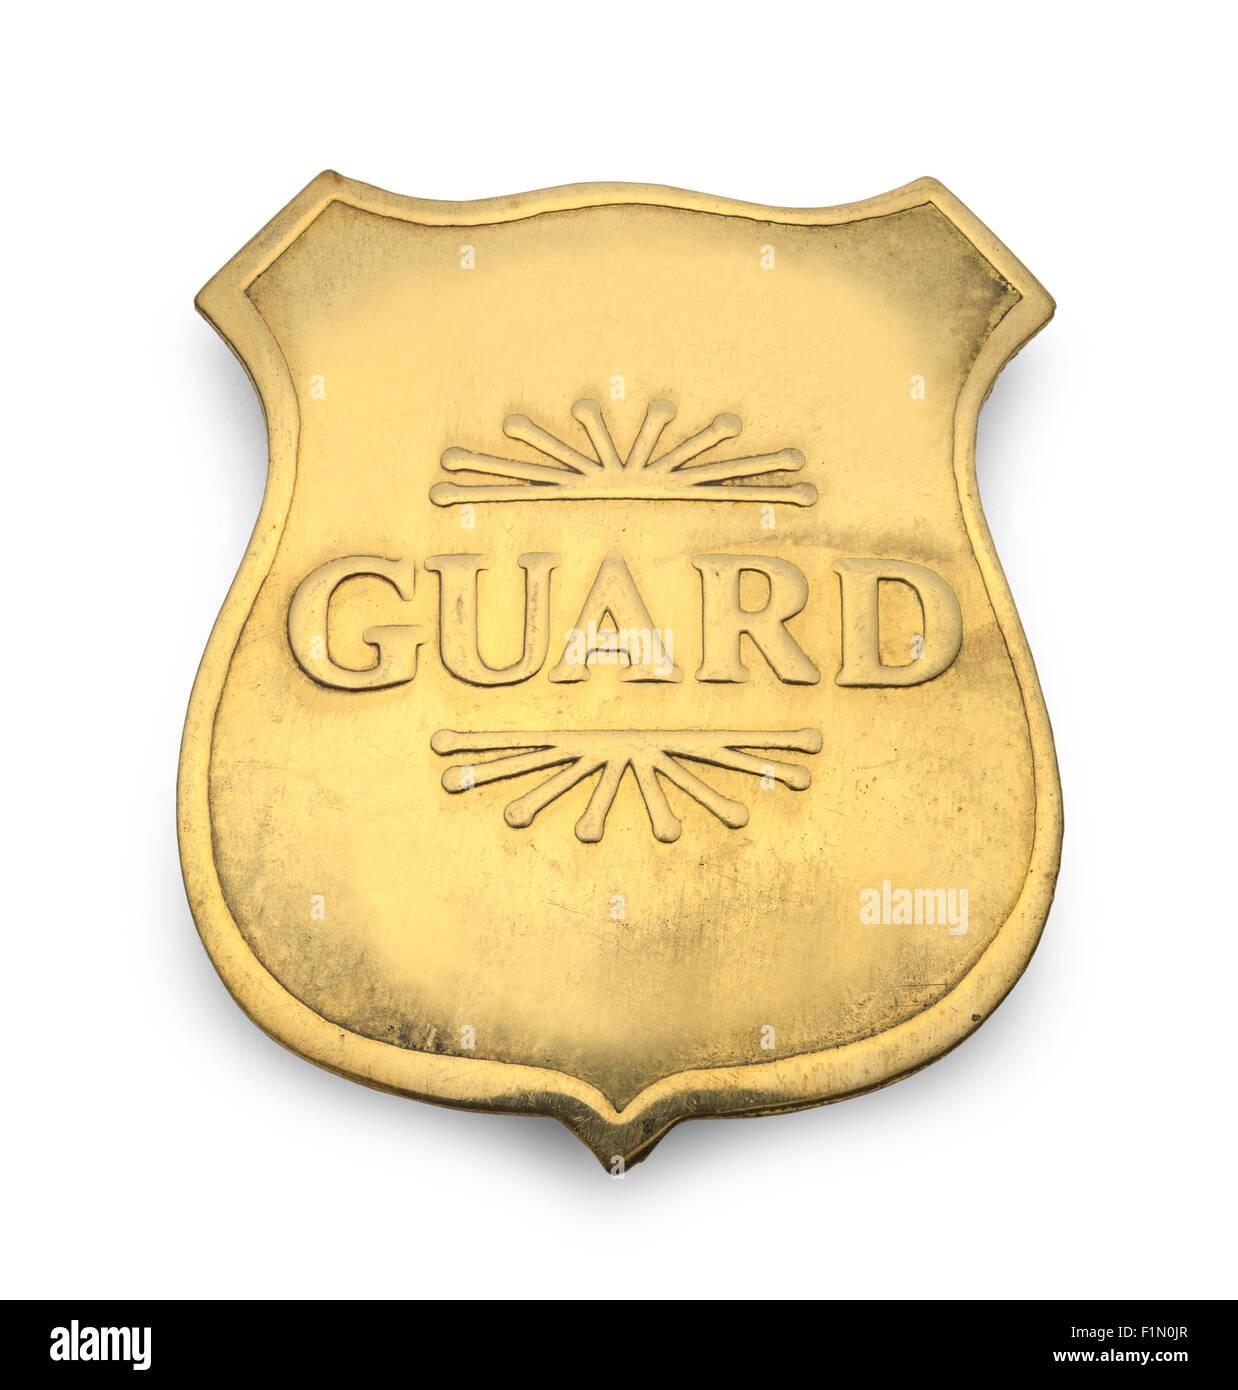 Old Guard Badge Isolated on White Background. - Stock Image